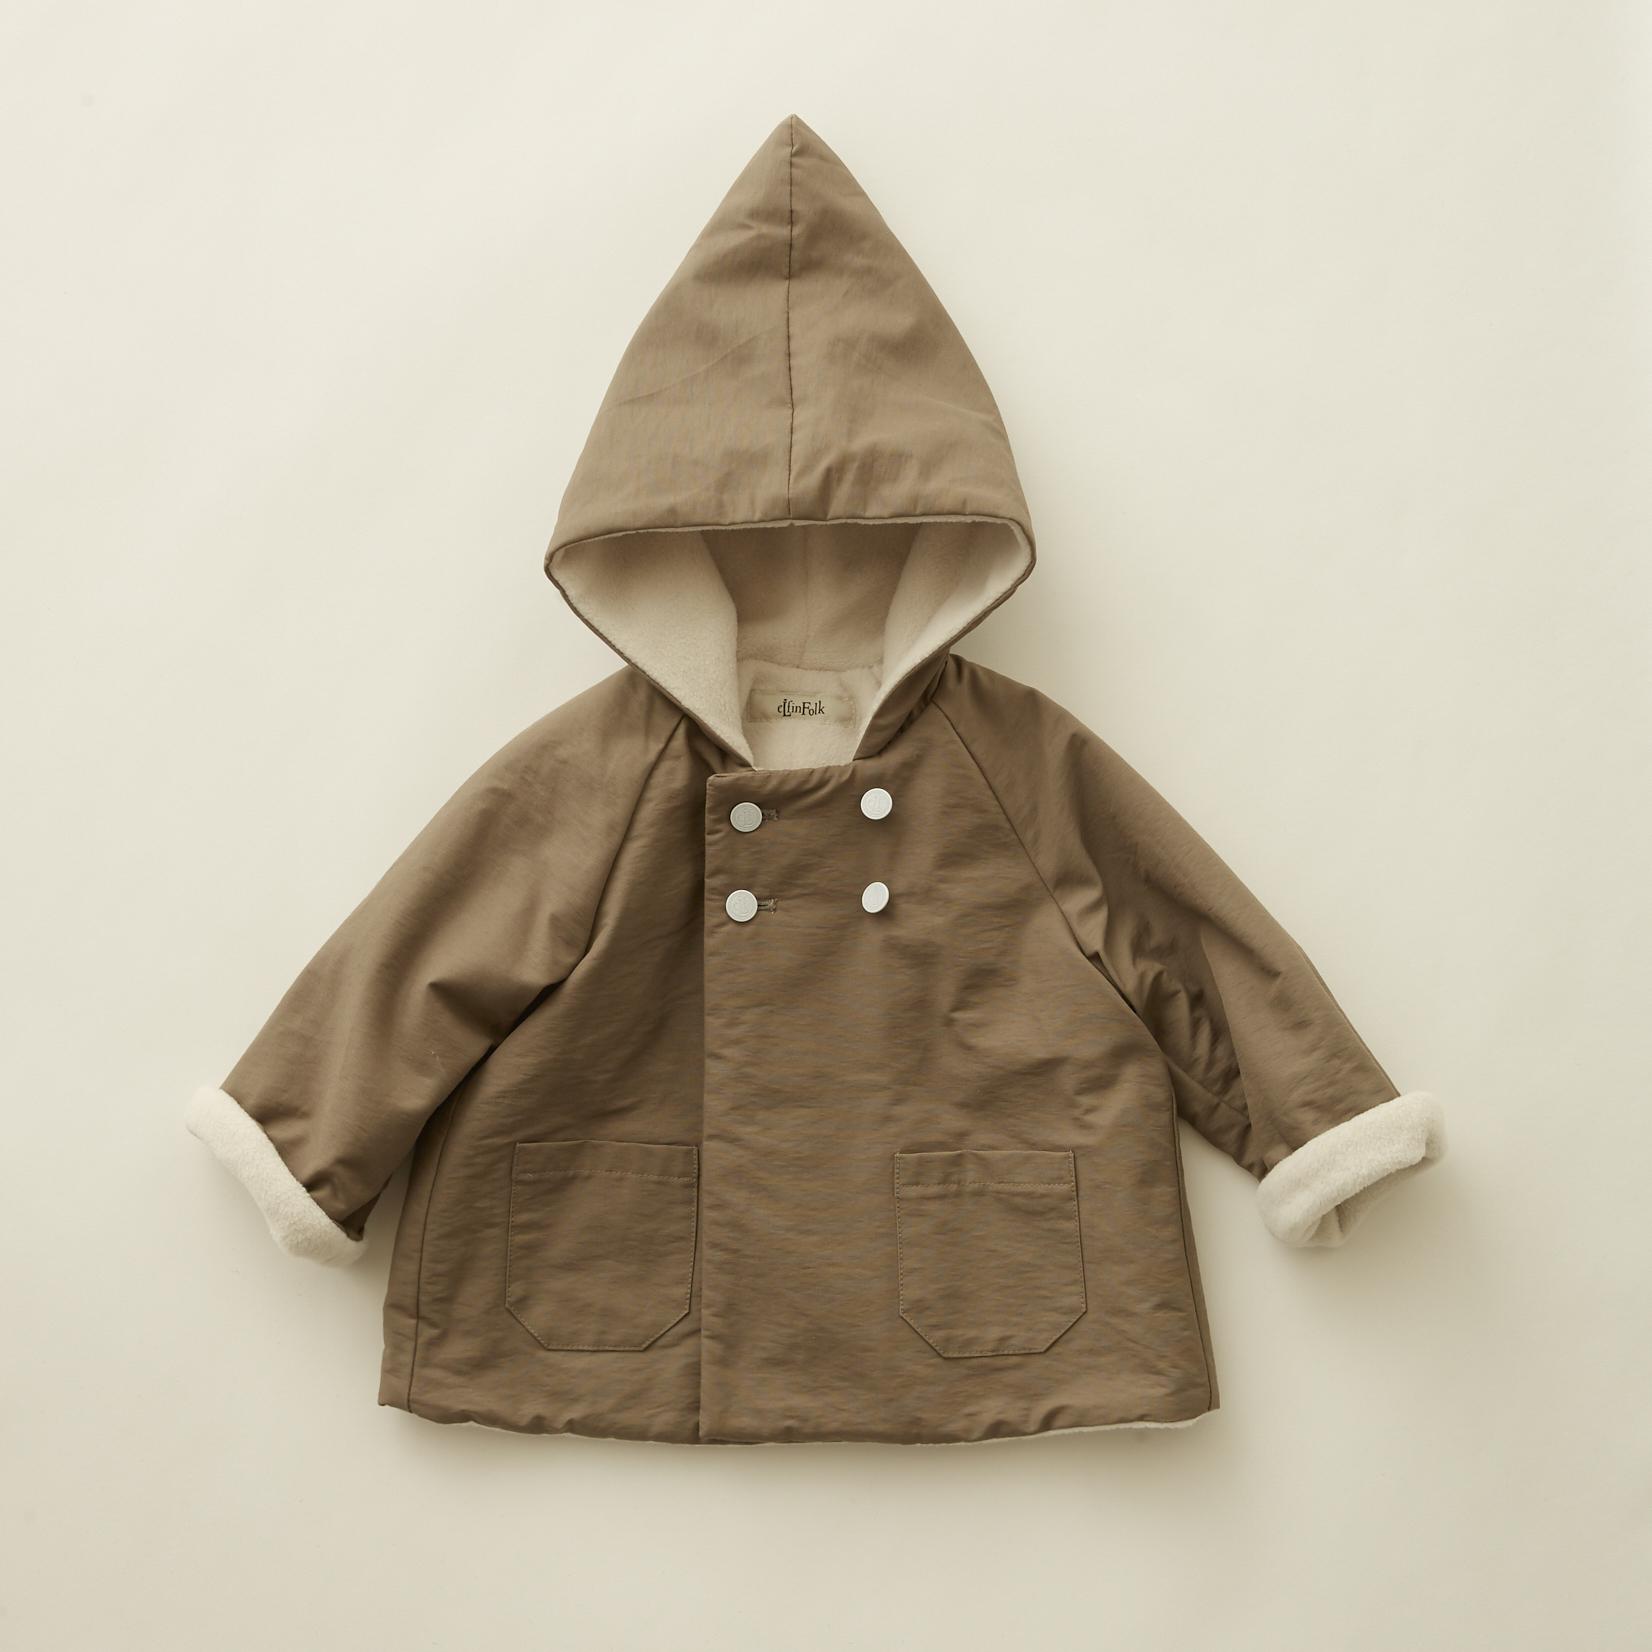 《eLfinFolk 2020AW》elf coat / mocha / 110-130cm